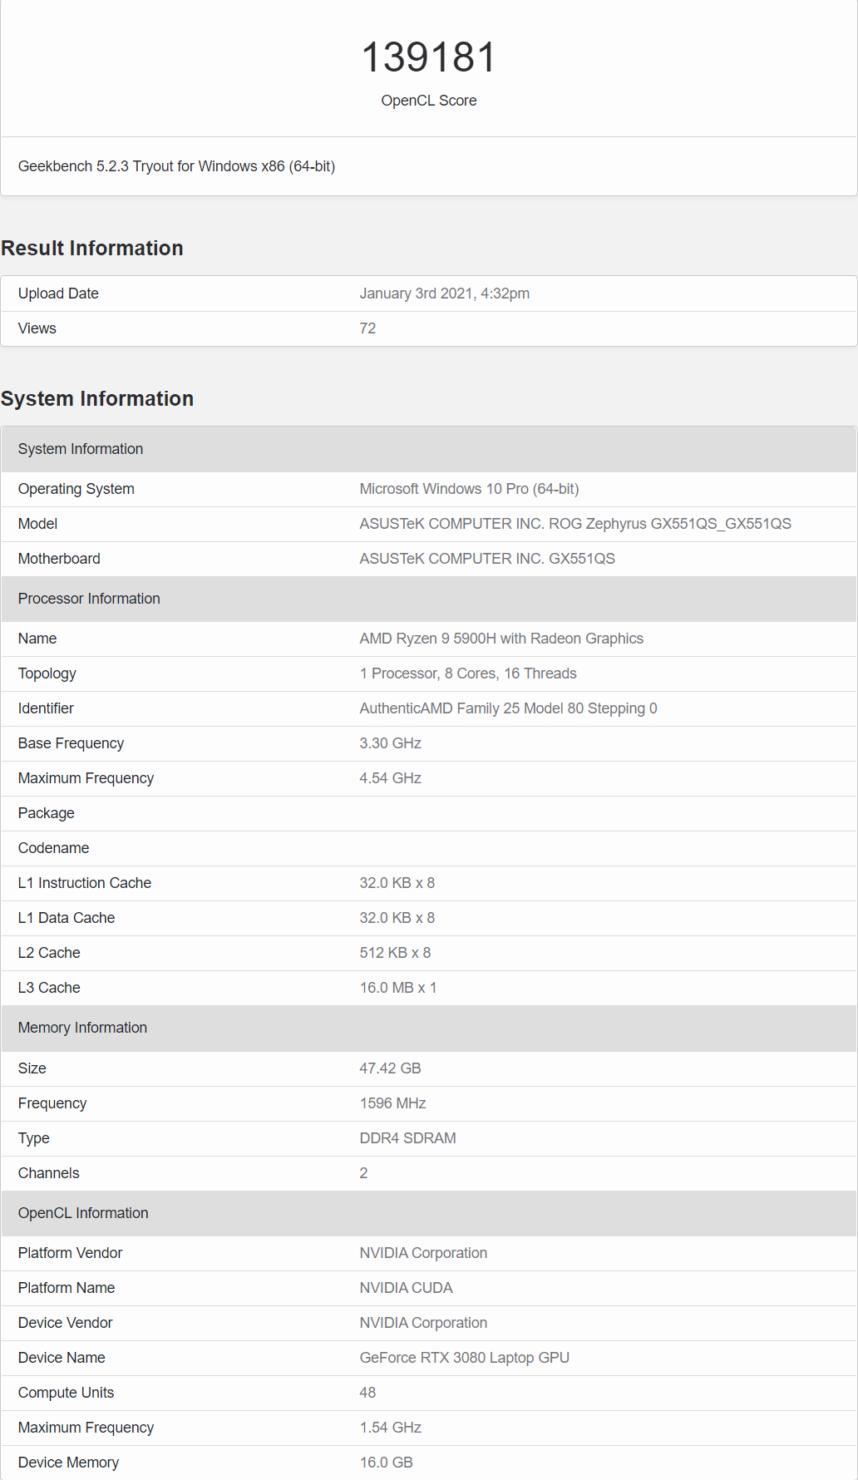 nvidia-geforce-rtx-3080-mobility-gpu-specs-benchmarks-leak-out-_1